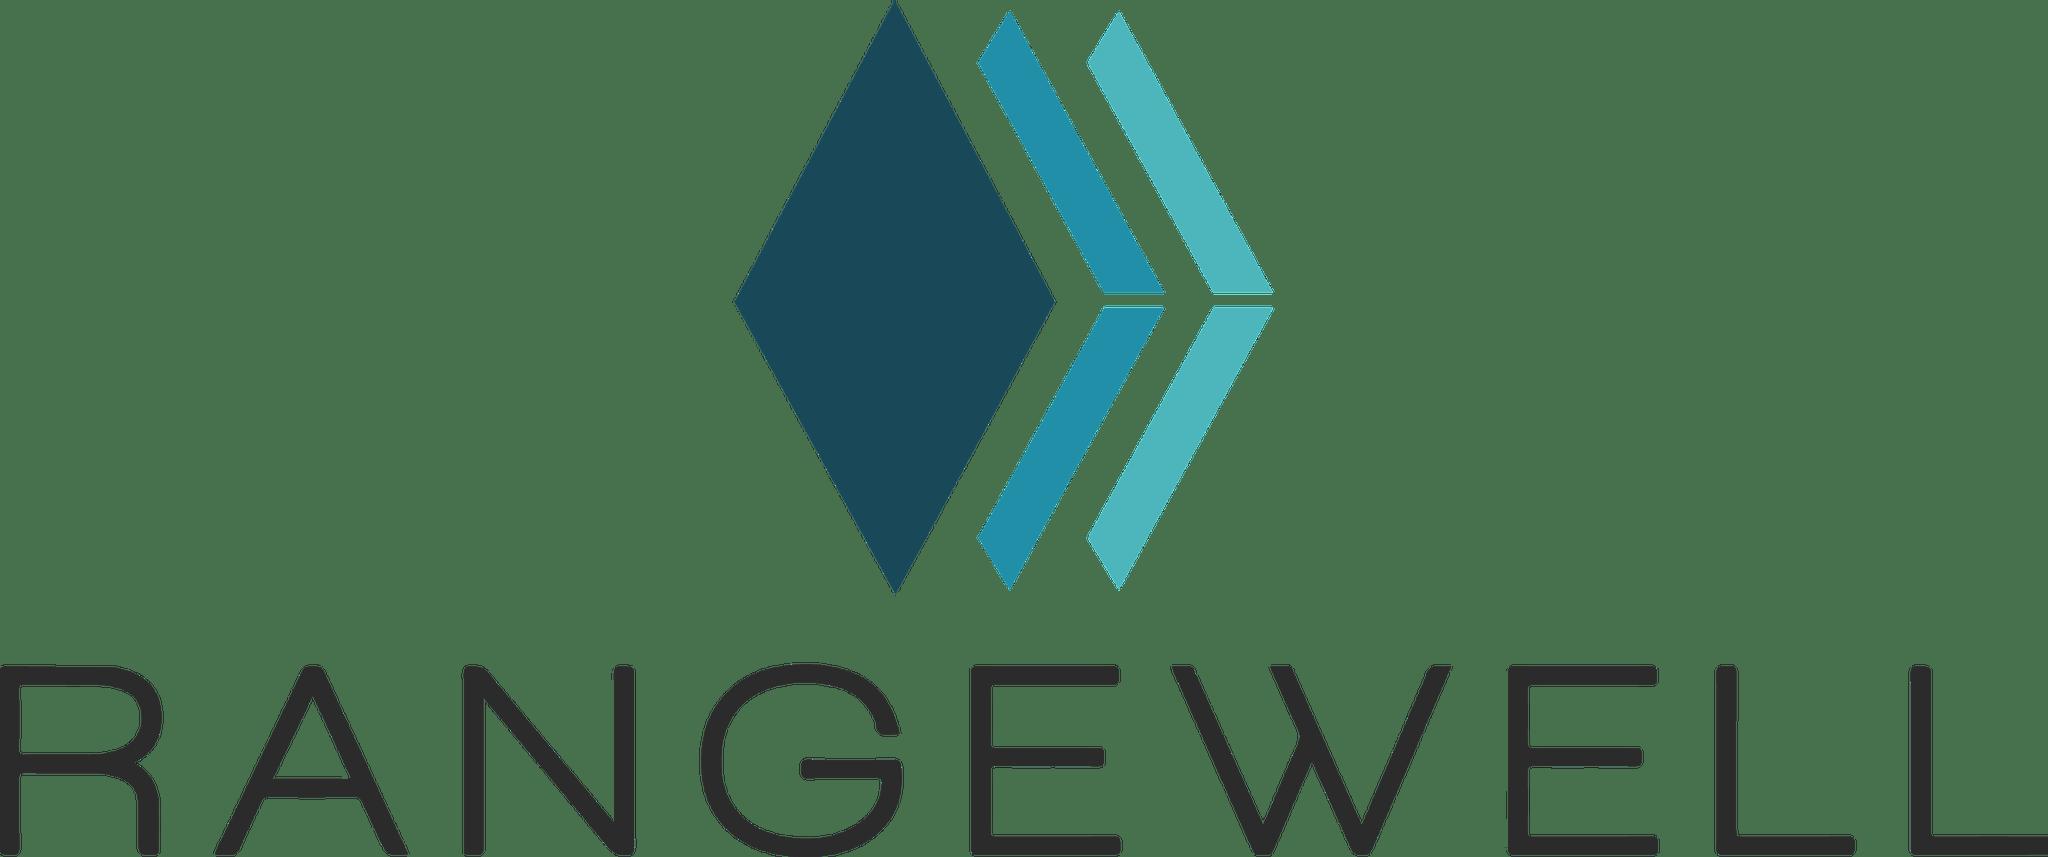 Rangewell Ltd